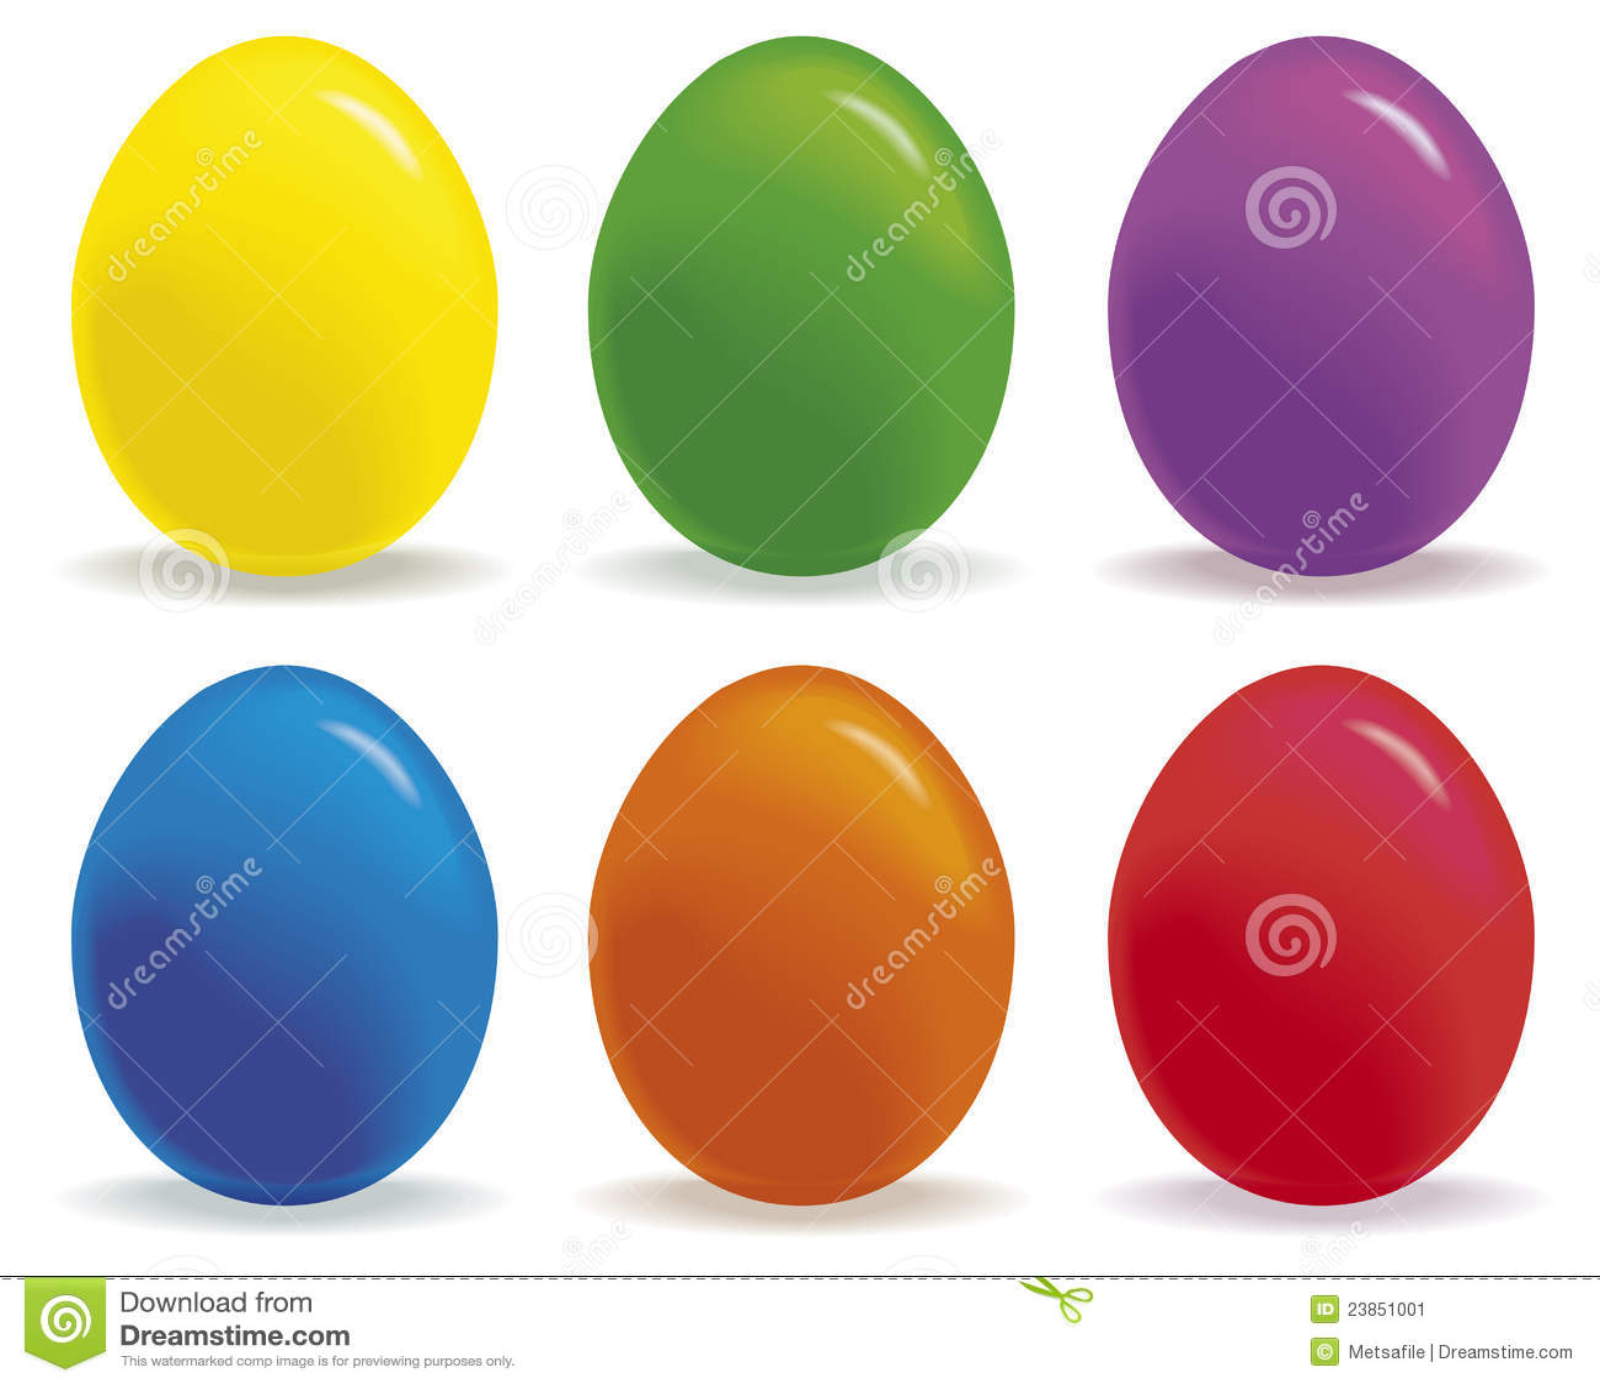 Huevos coloreados